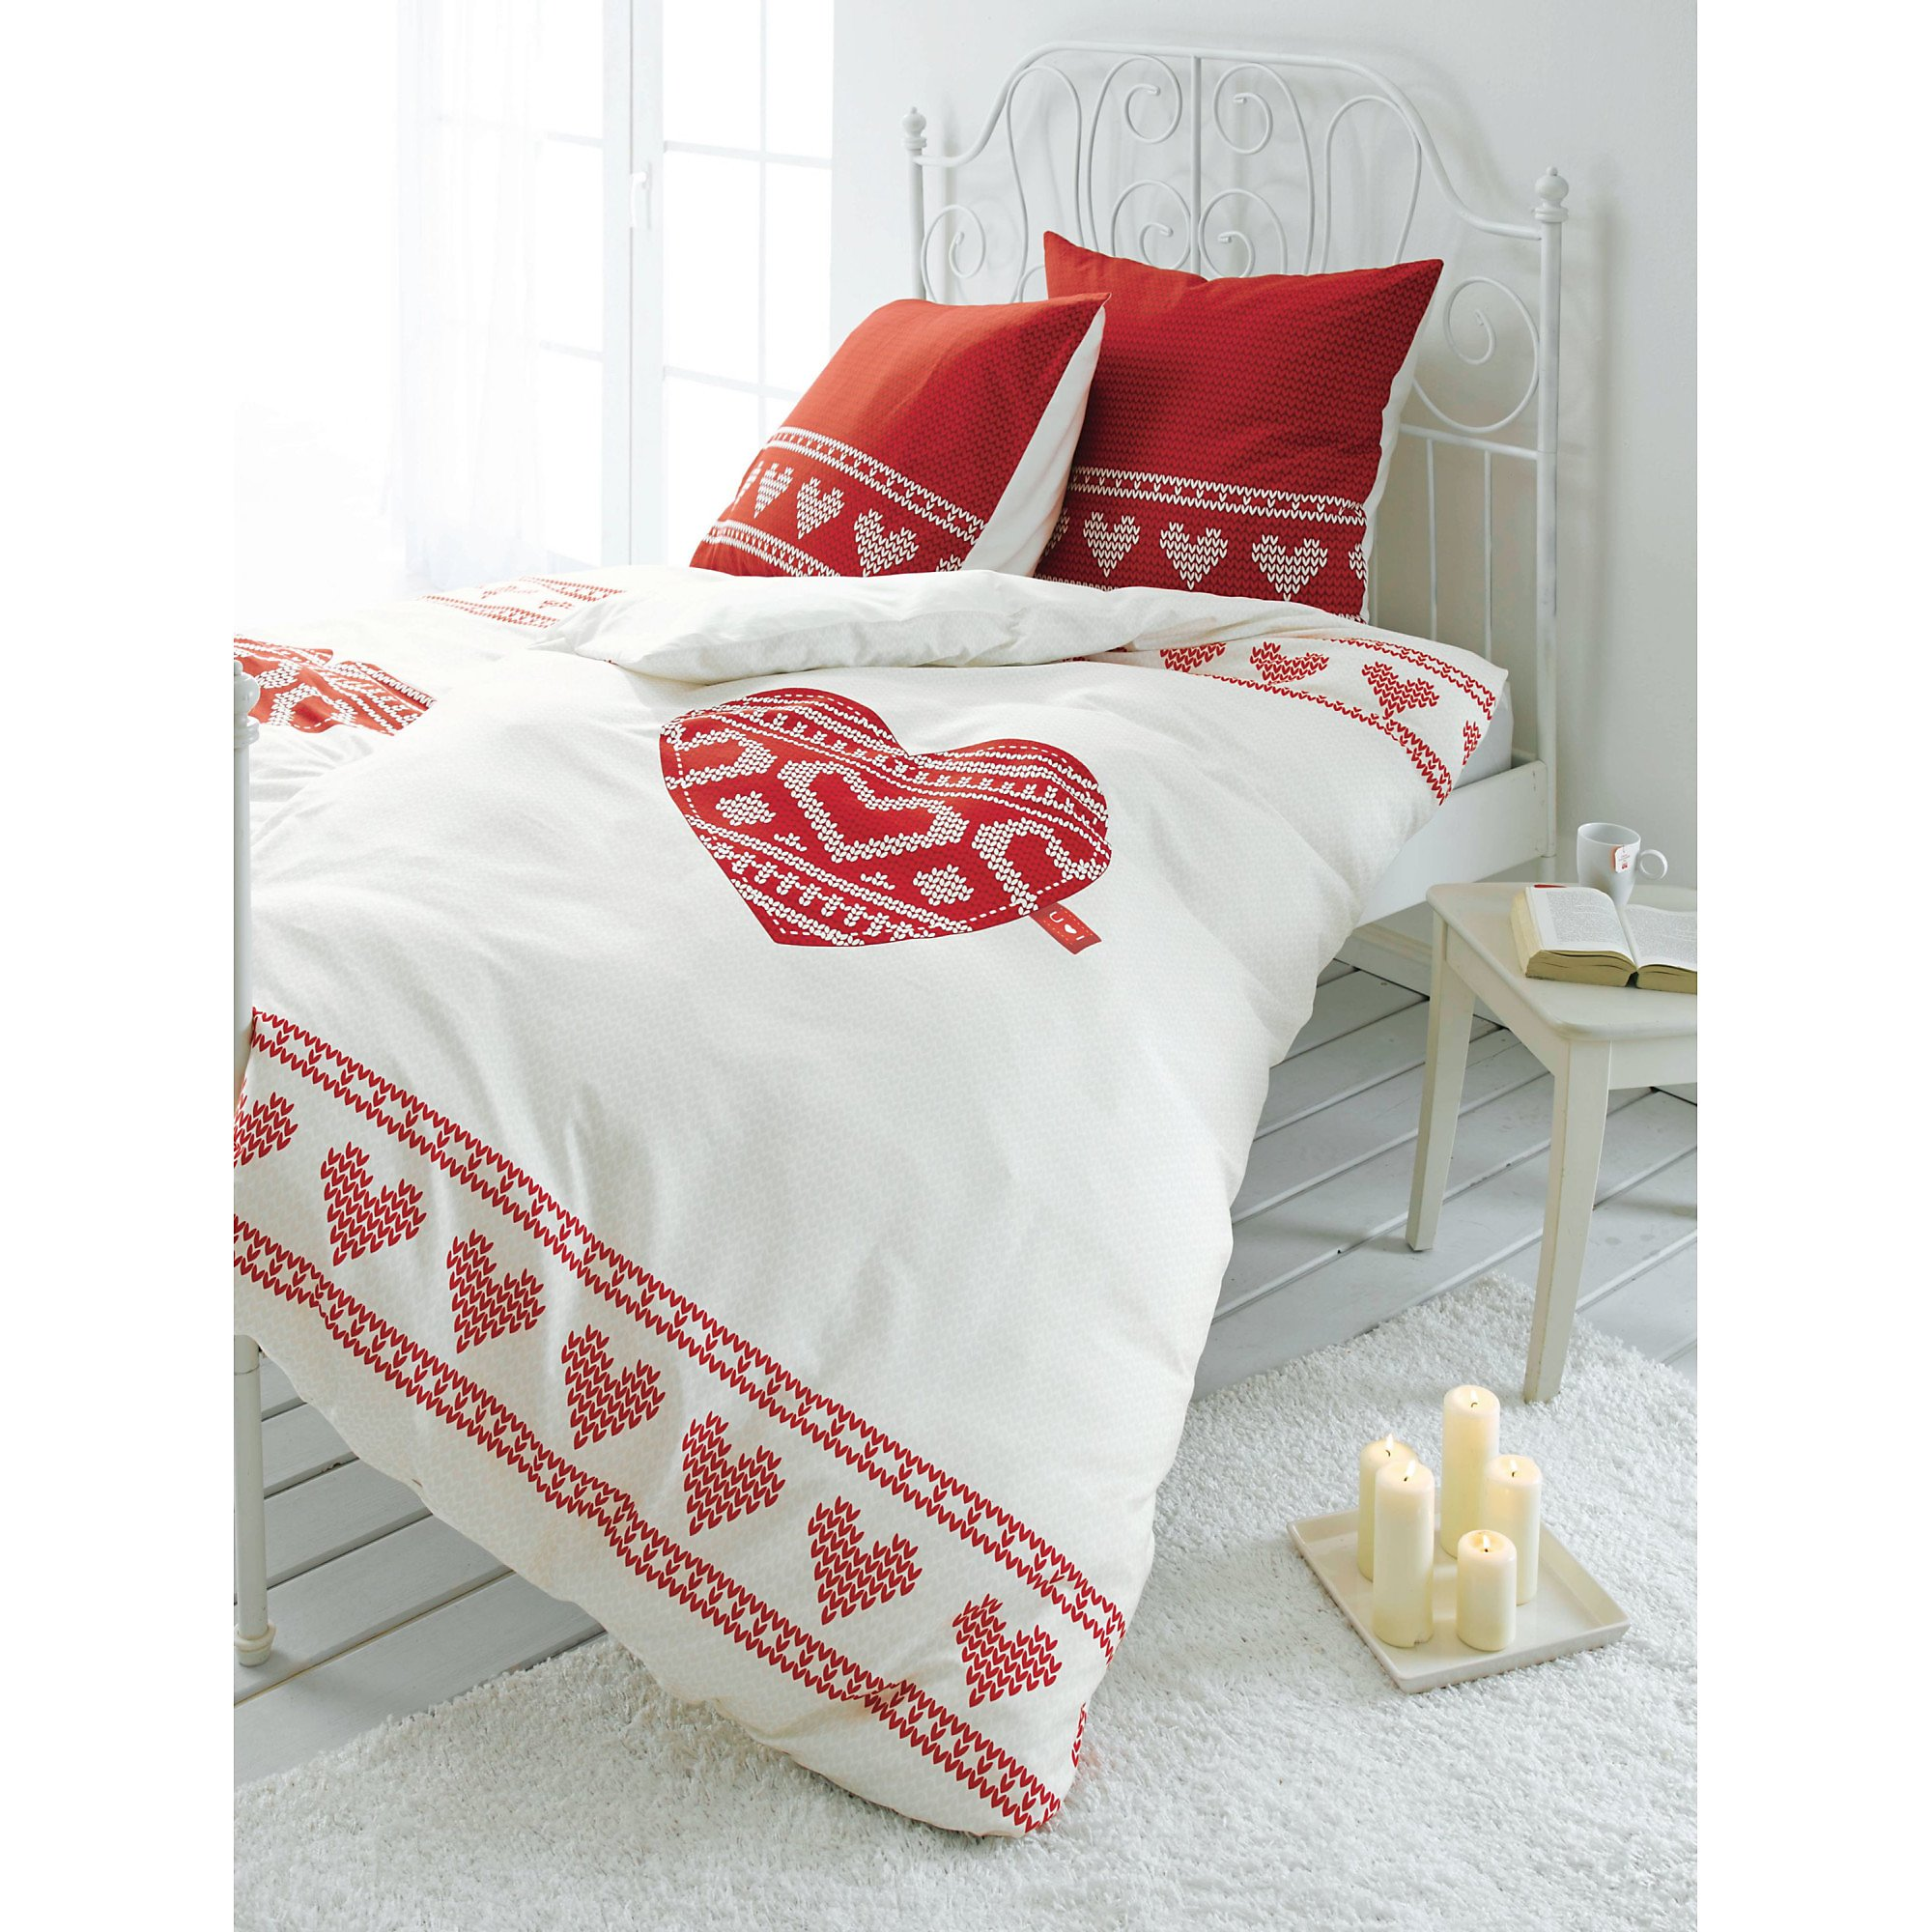 Bettwäsche Strickherz Rot Weiß 155x220 Bestellen Weltbildde